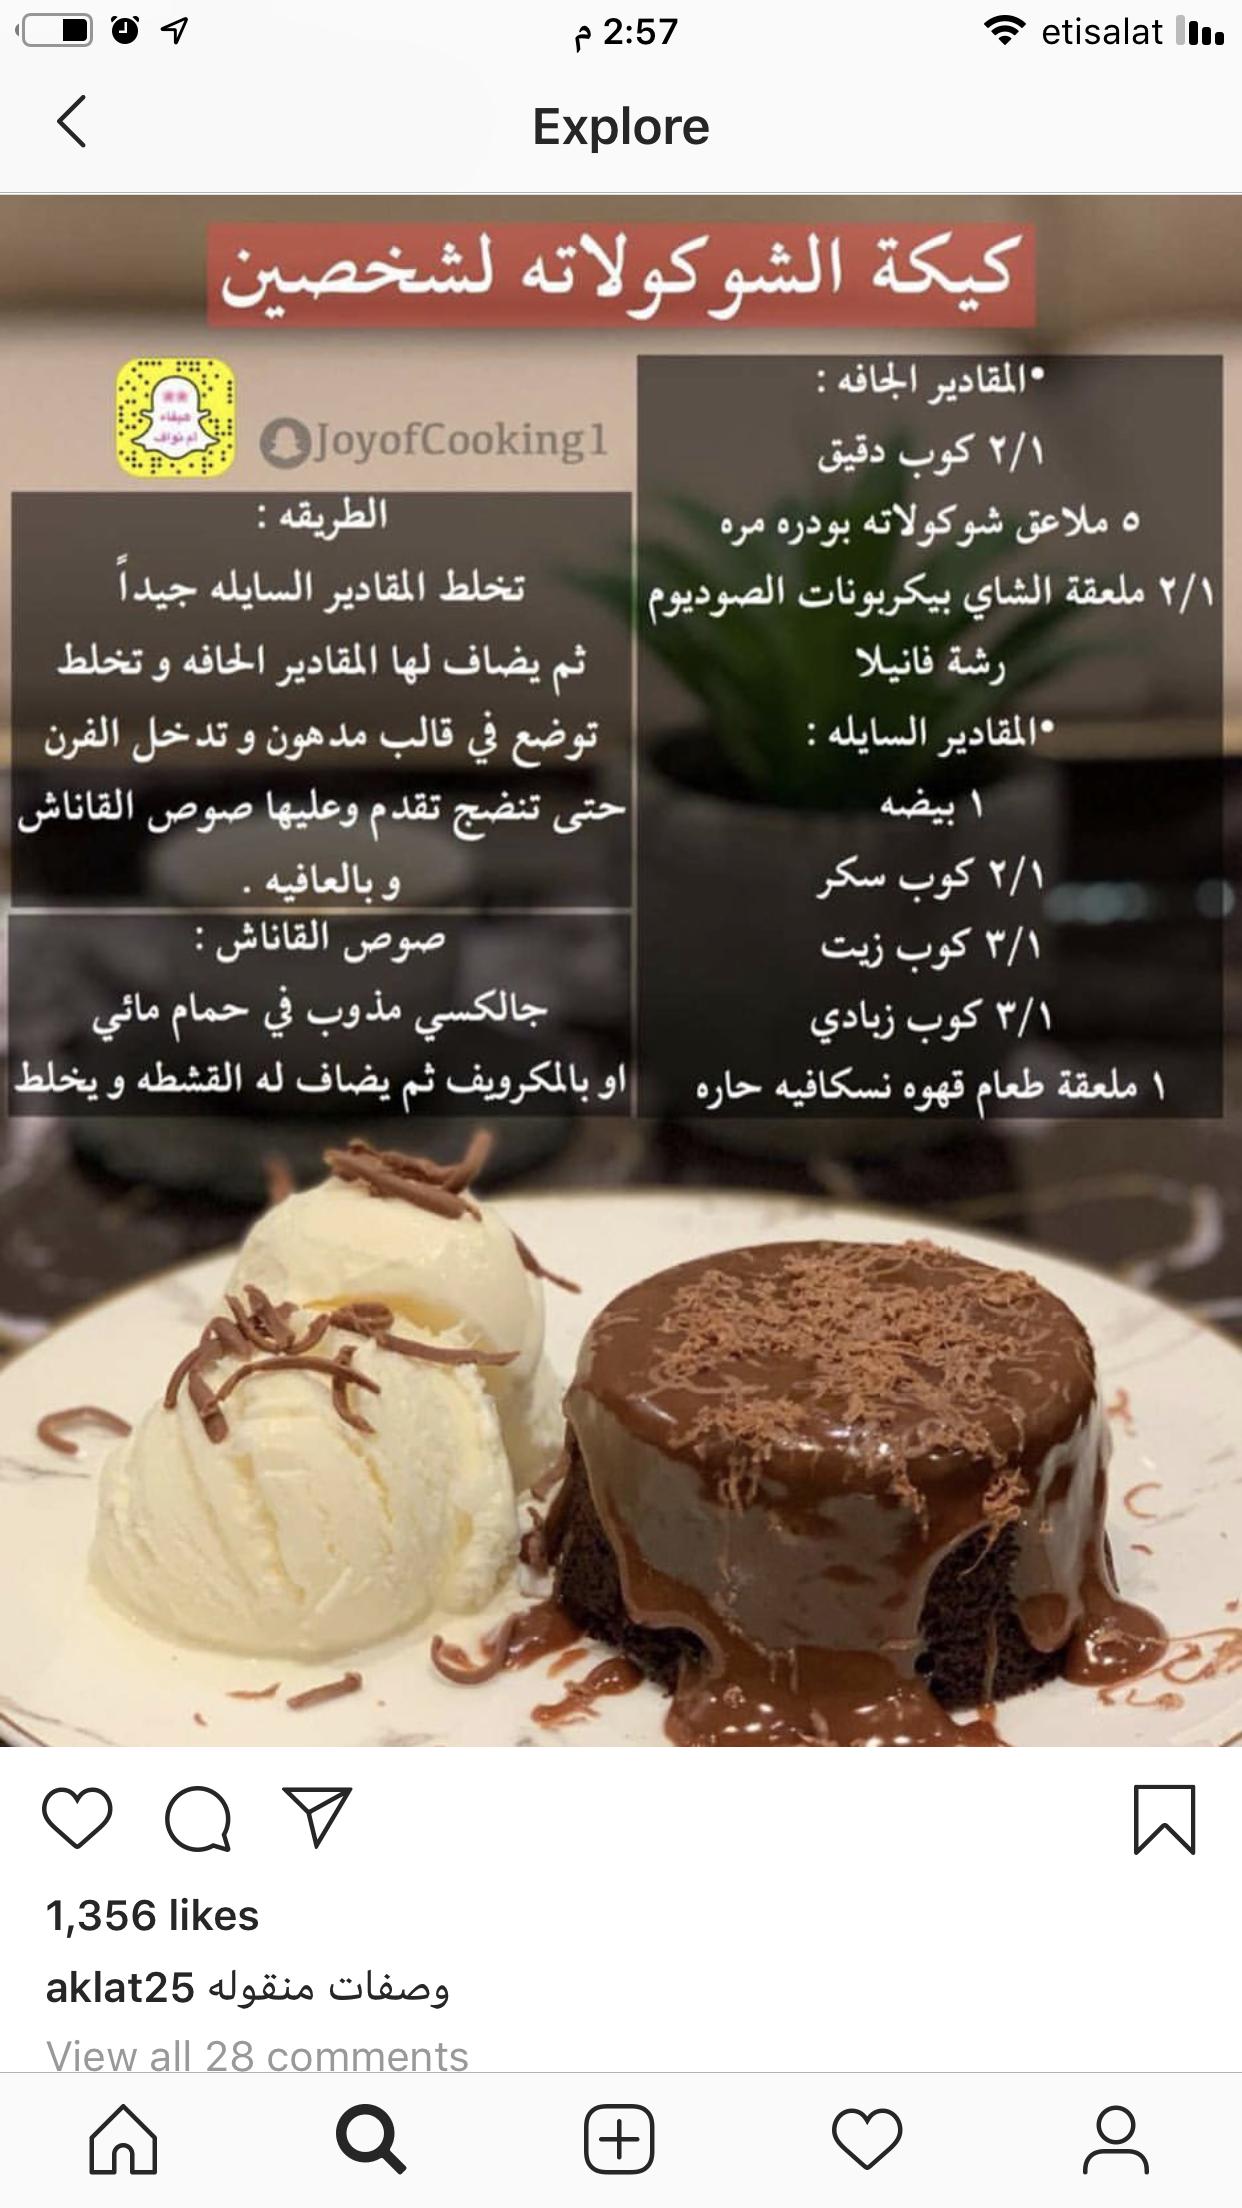 Pin By ا ـ ـ ہم كـہ يـ ـان On Food Yummy Food Dessert Sweets Recipes Save Food